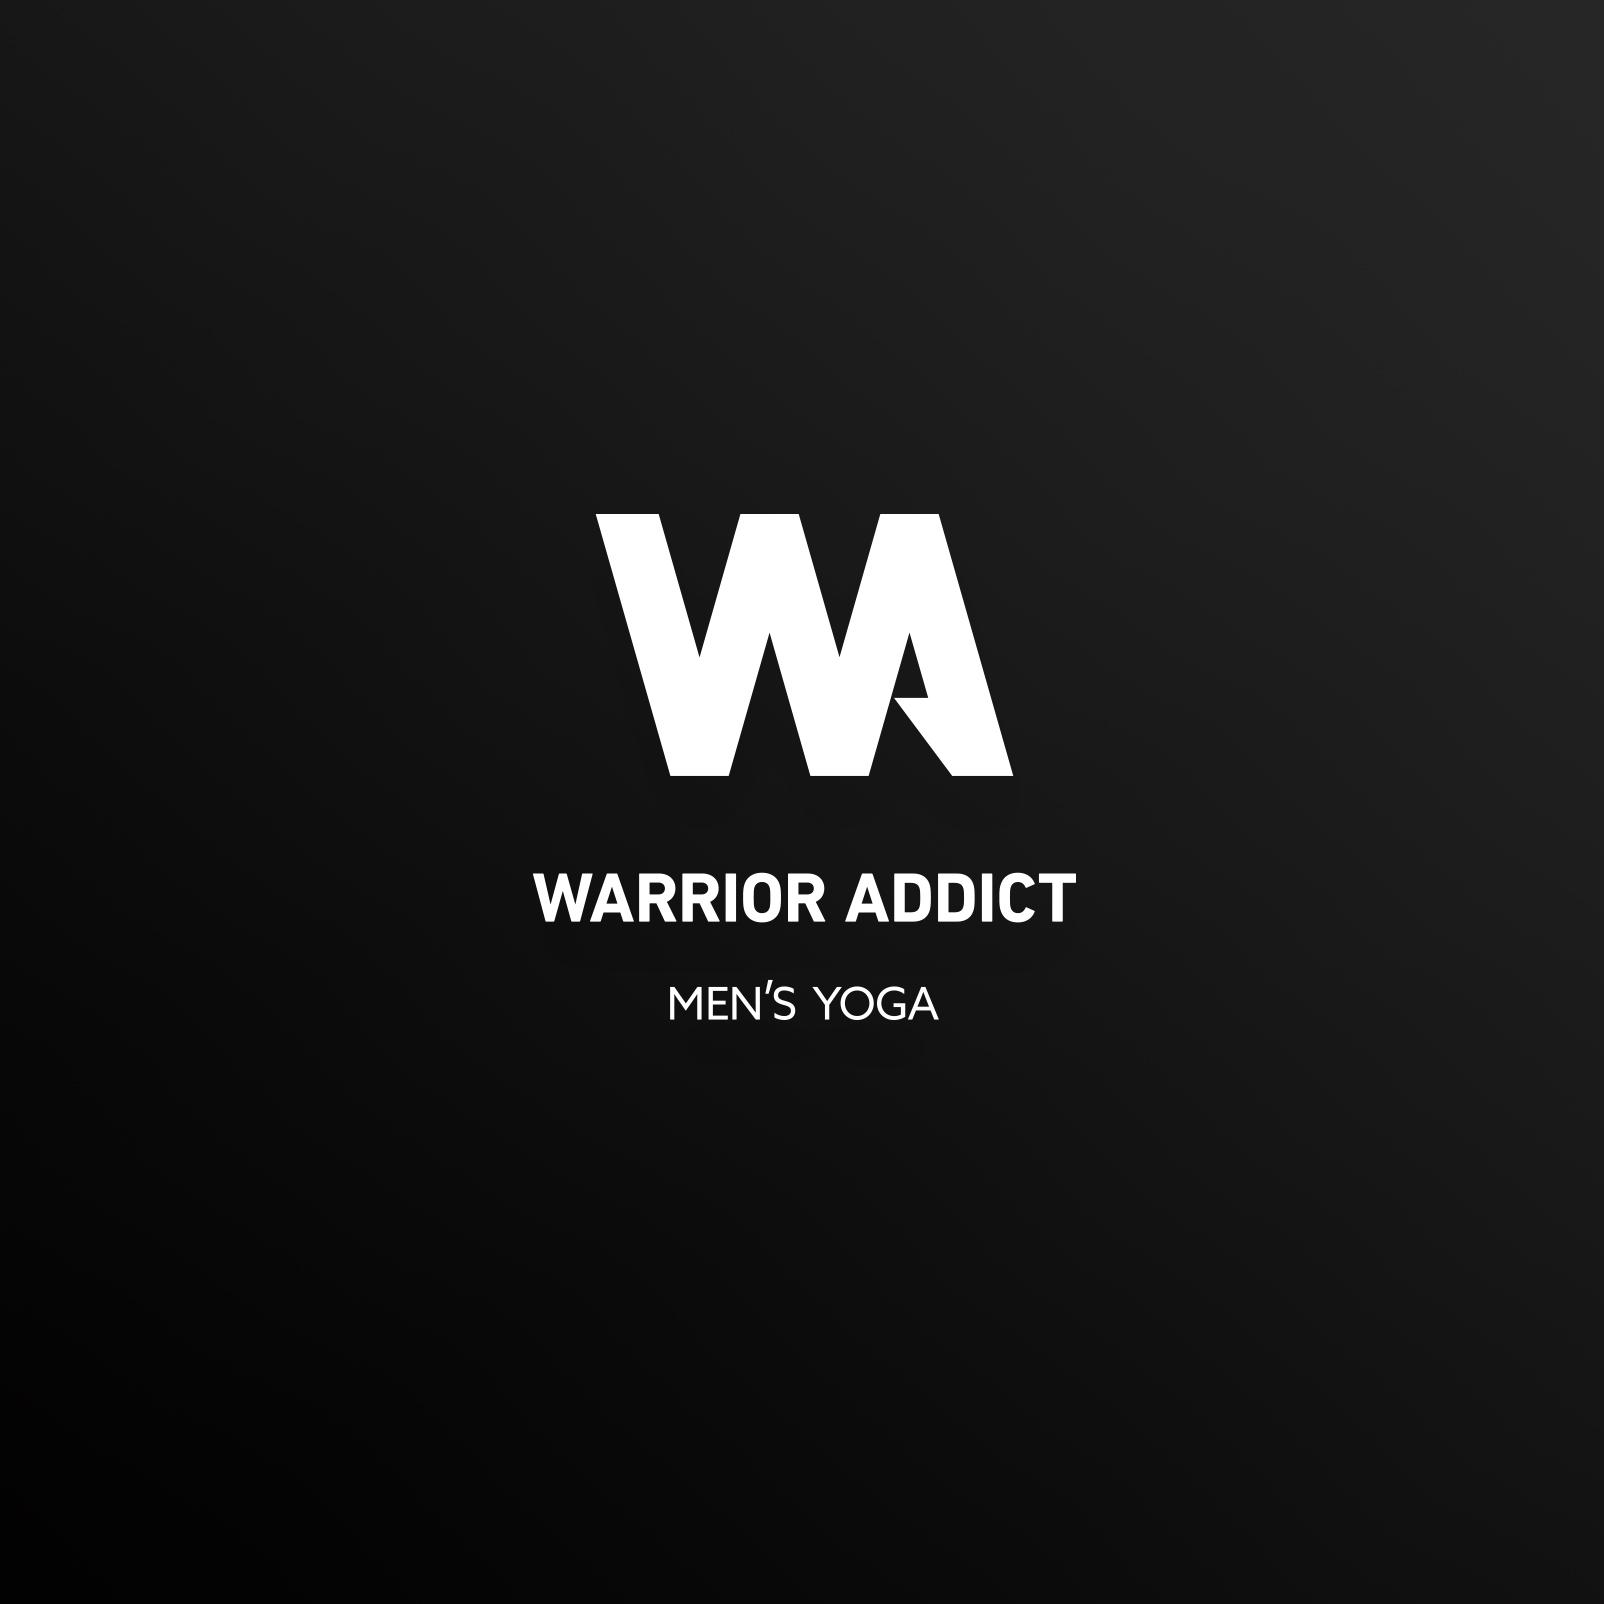 wa-logo-square-by-also-agency-1.jpg